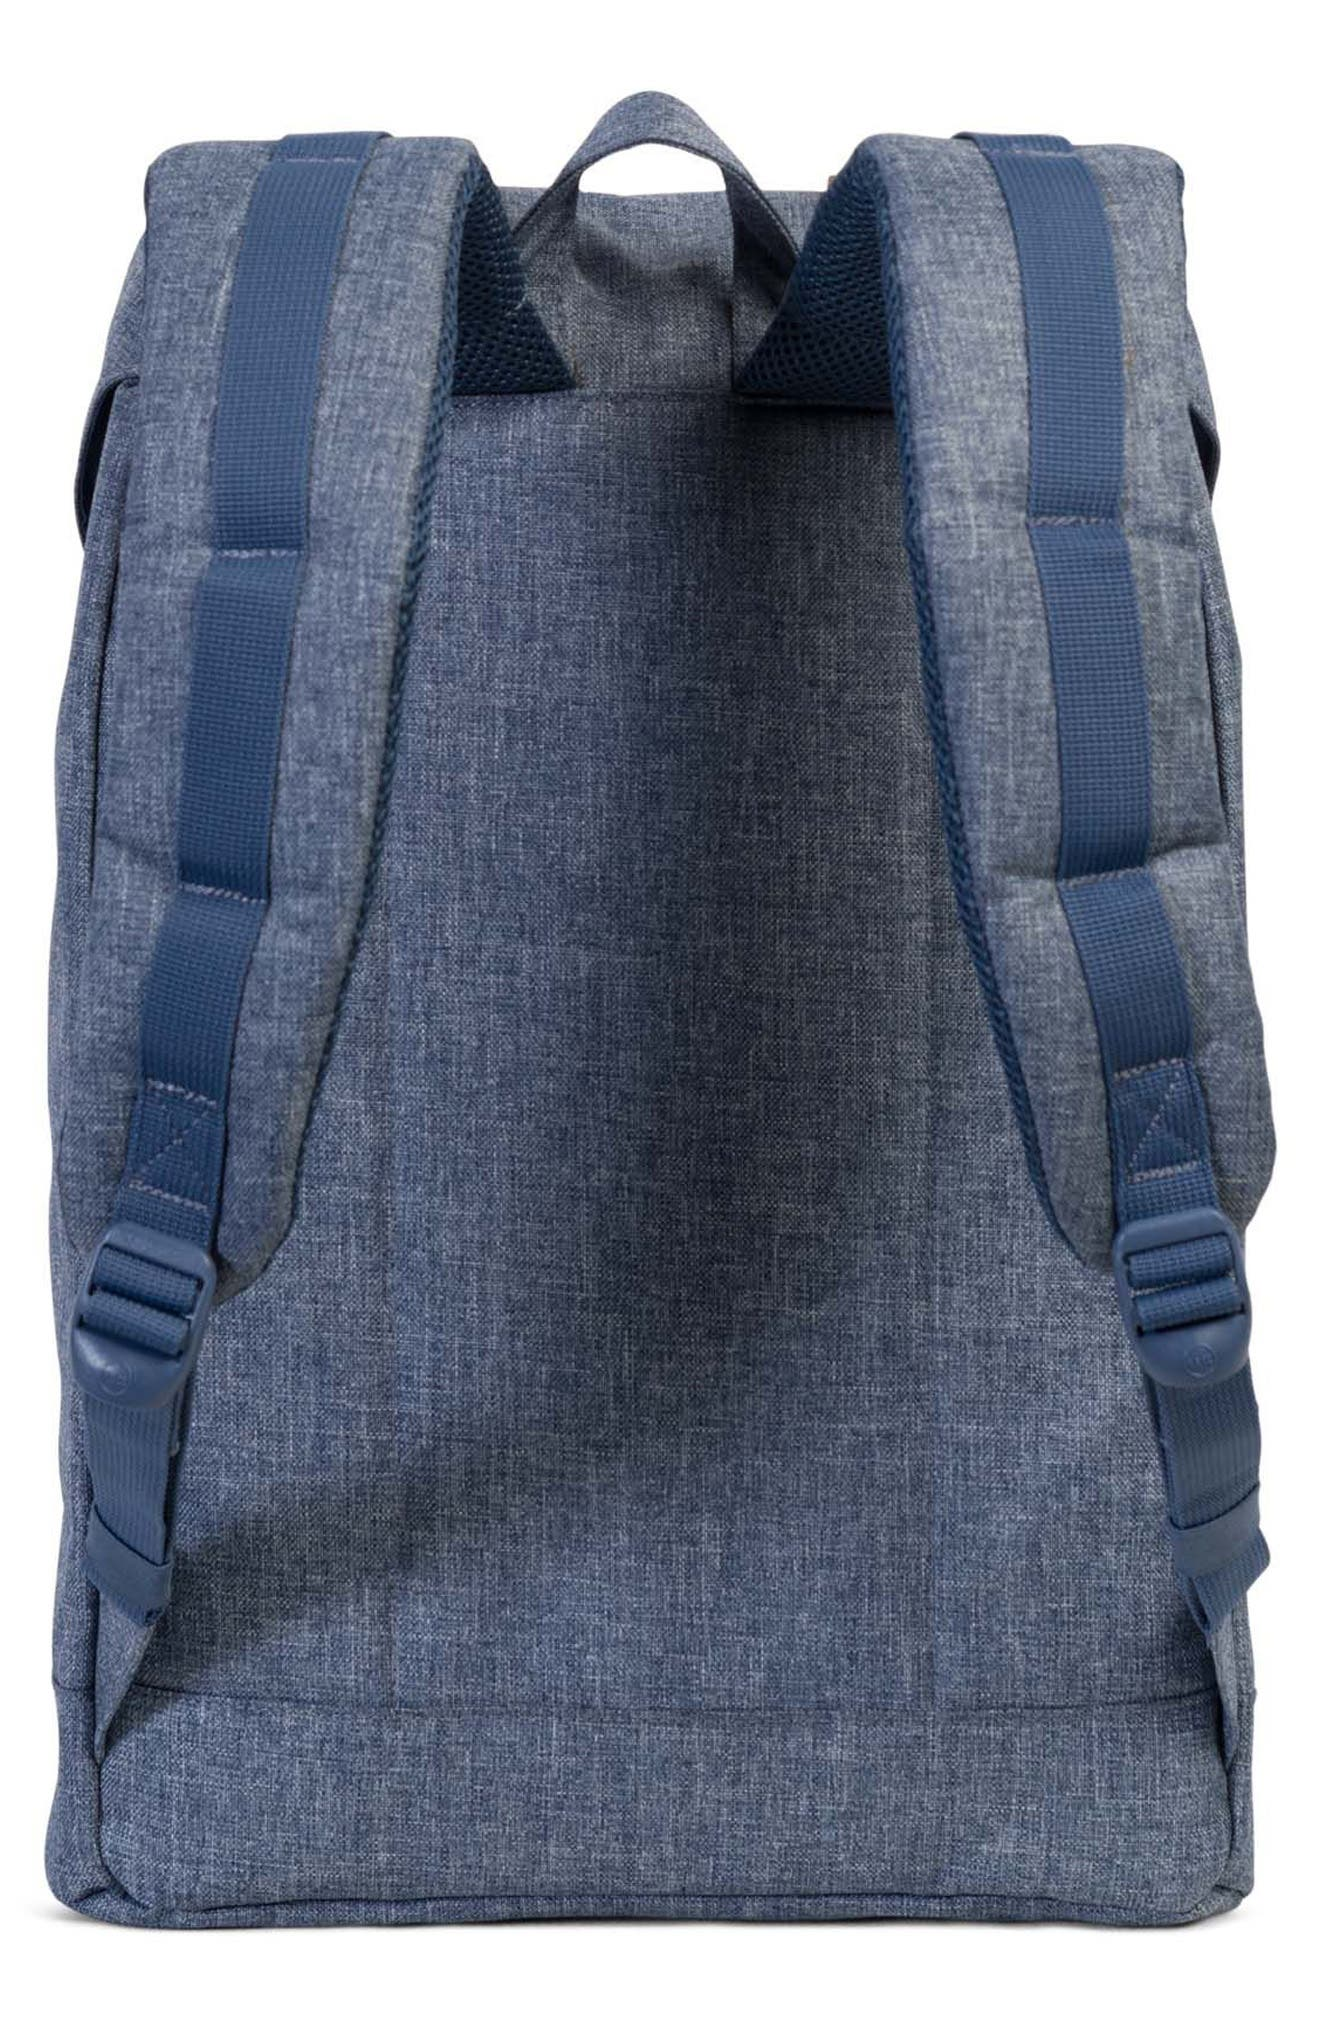 'Retreat' Backpack,                             Alternate thumbnail 2, color,                             Dark Chambray Cross Hatch